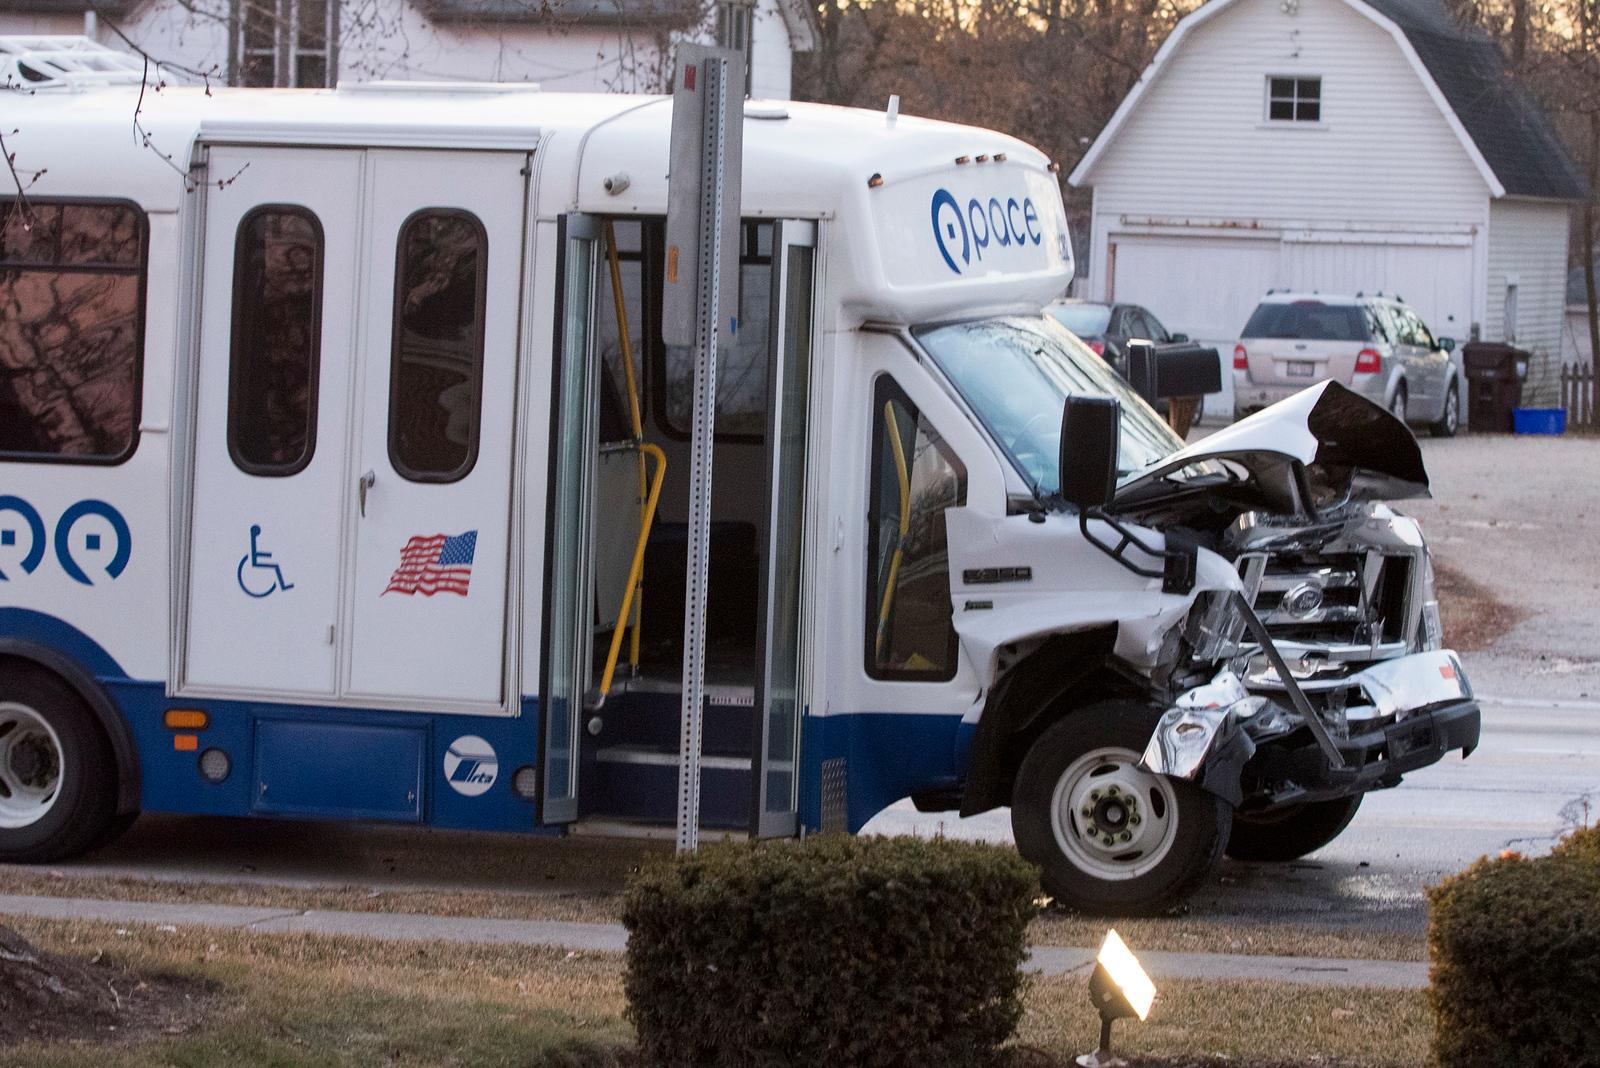 hnews_sat0113_Buss_Accident.jpg